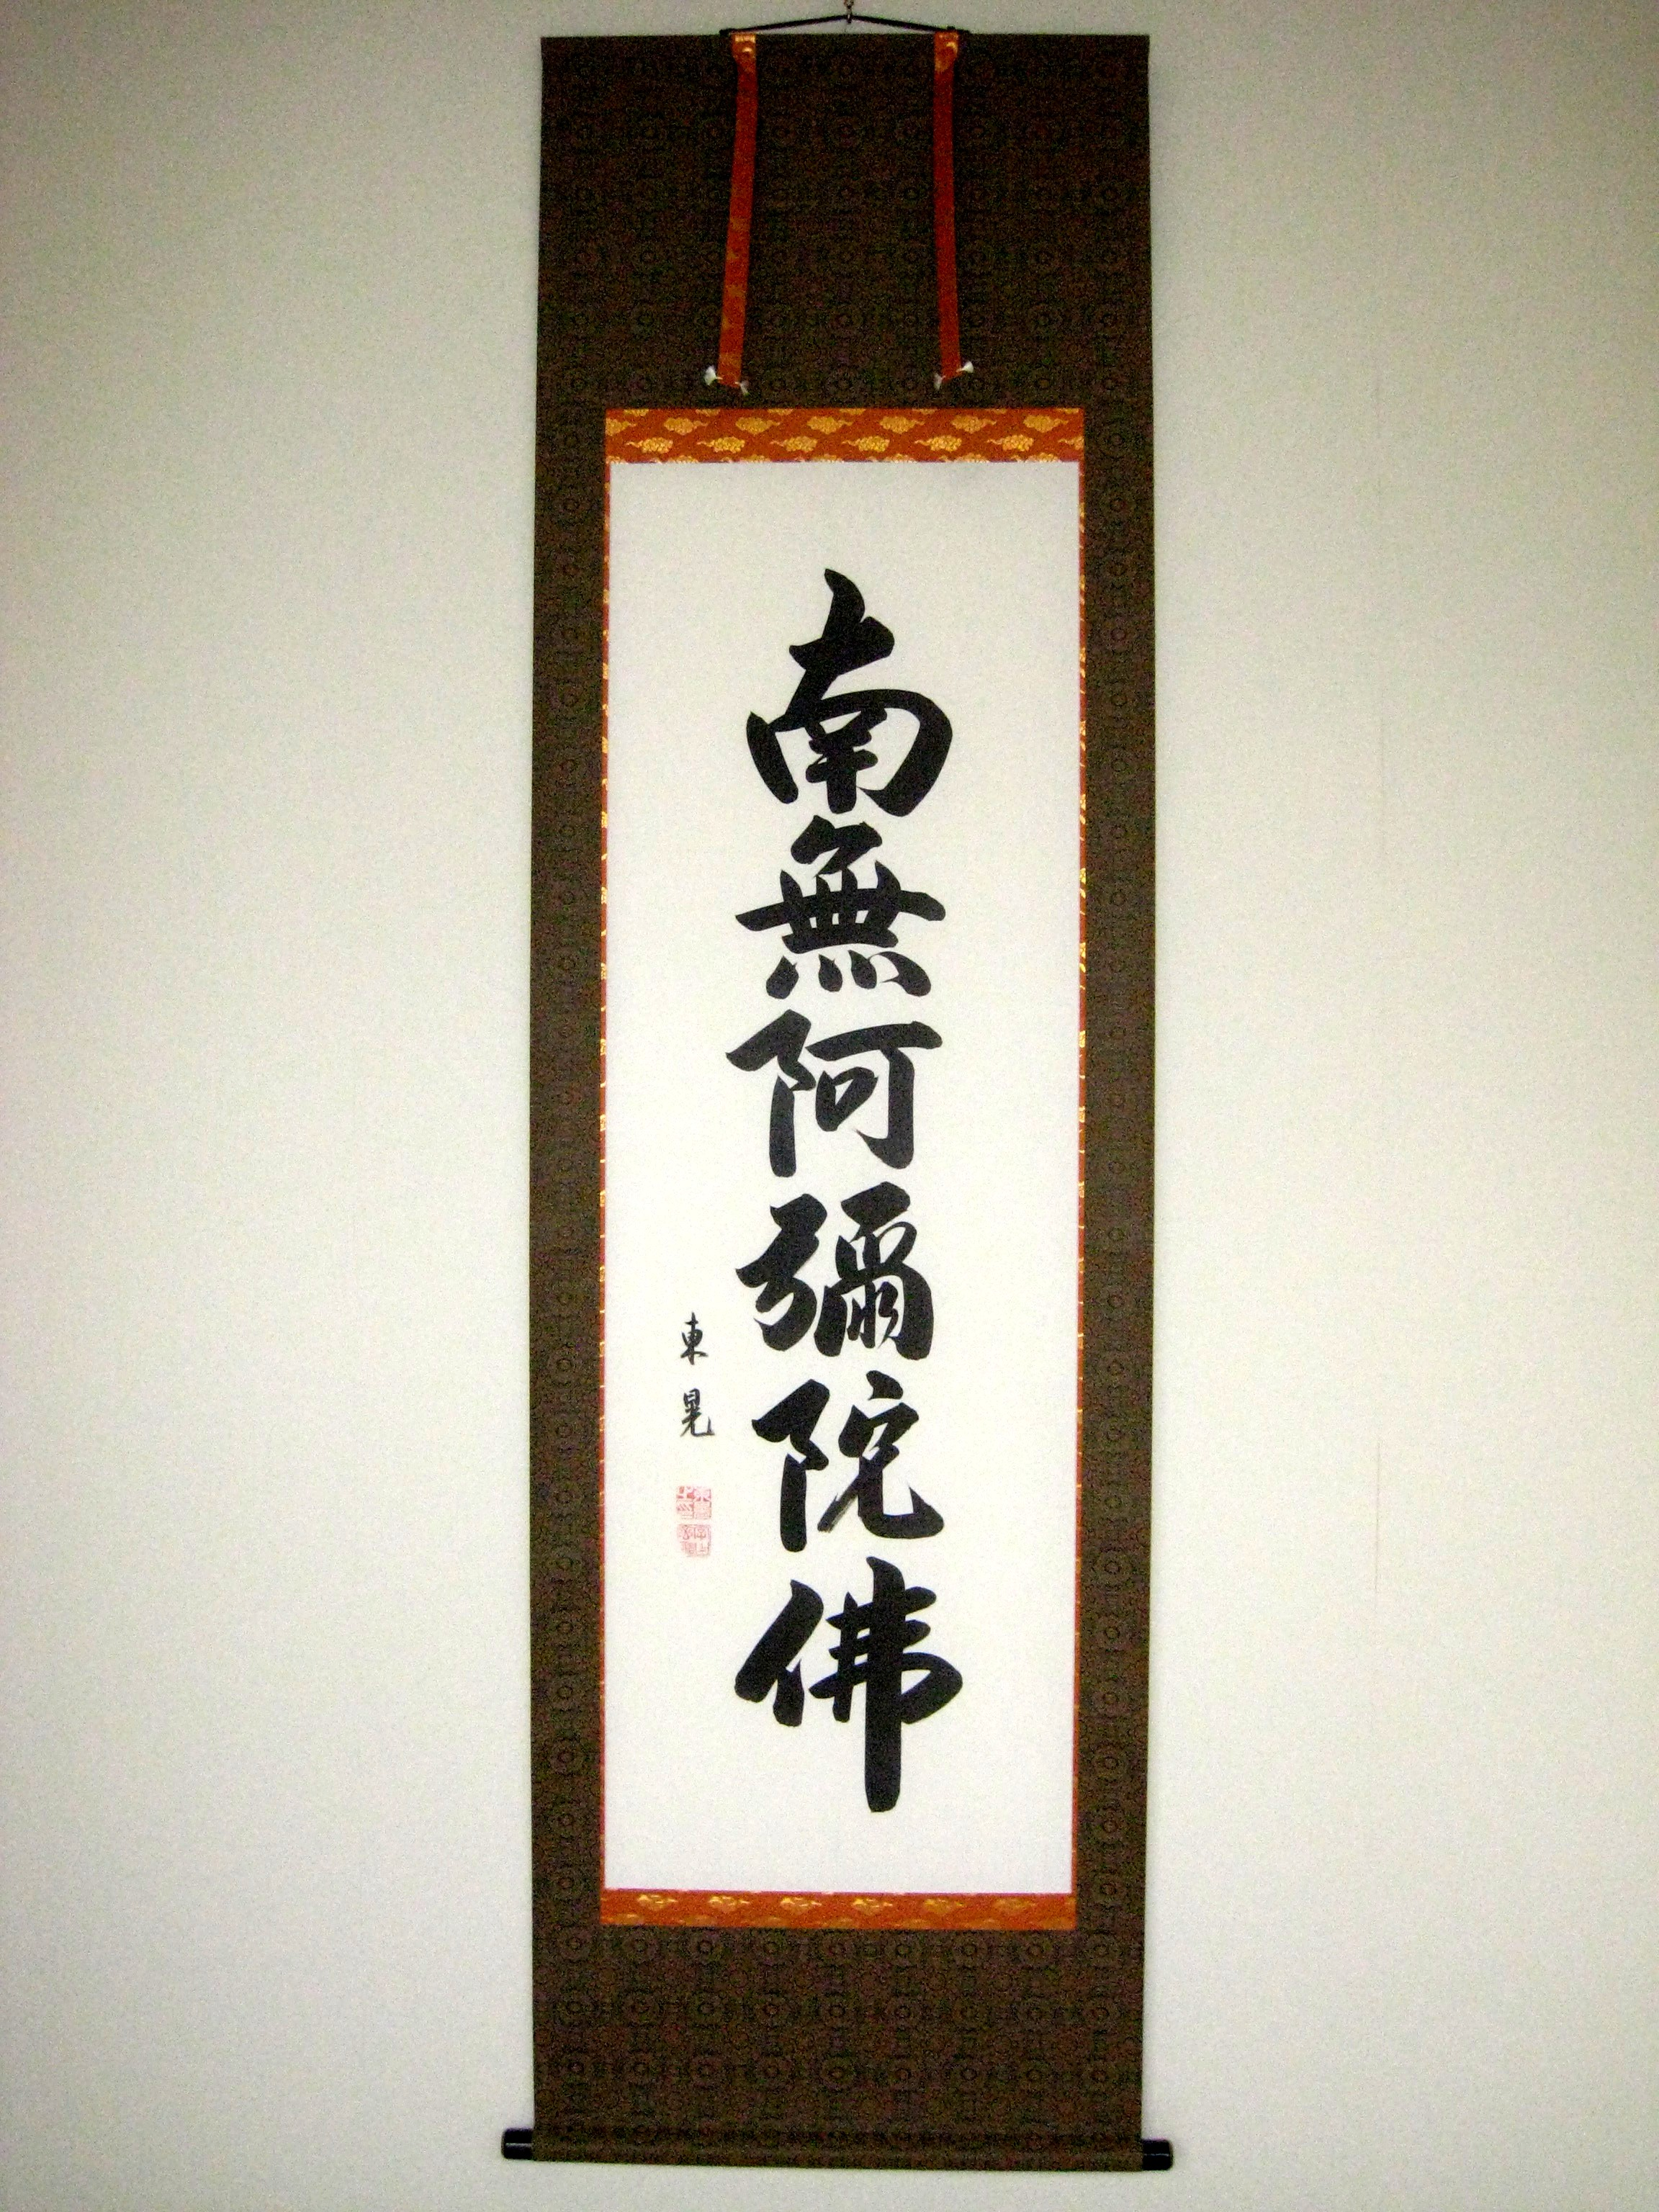 掛け軸 六字名号◆飯尾東晃